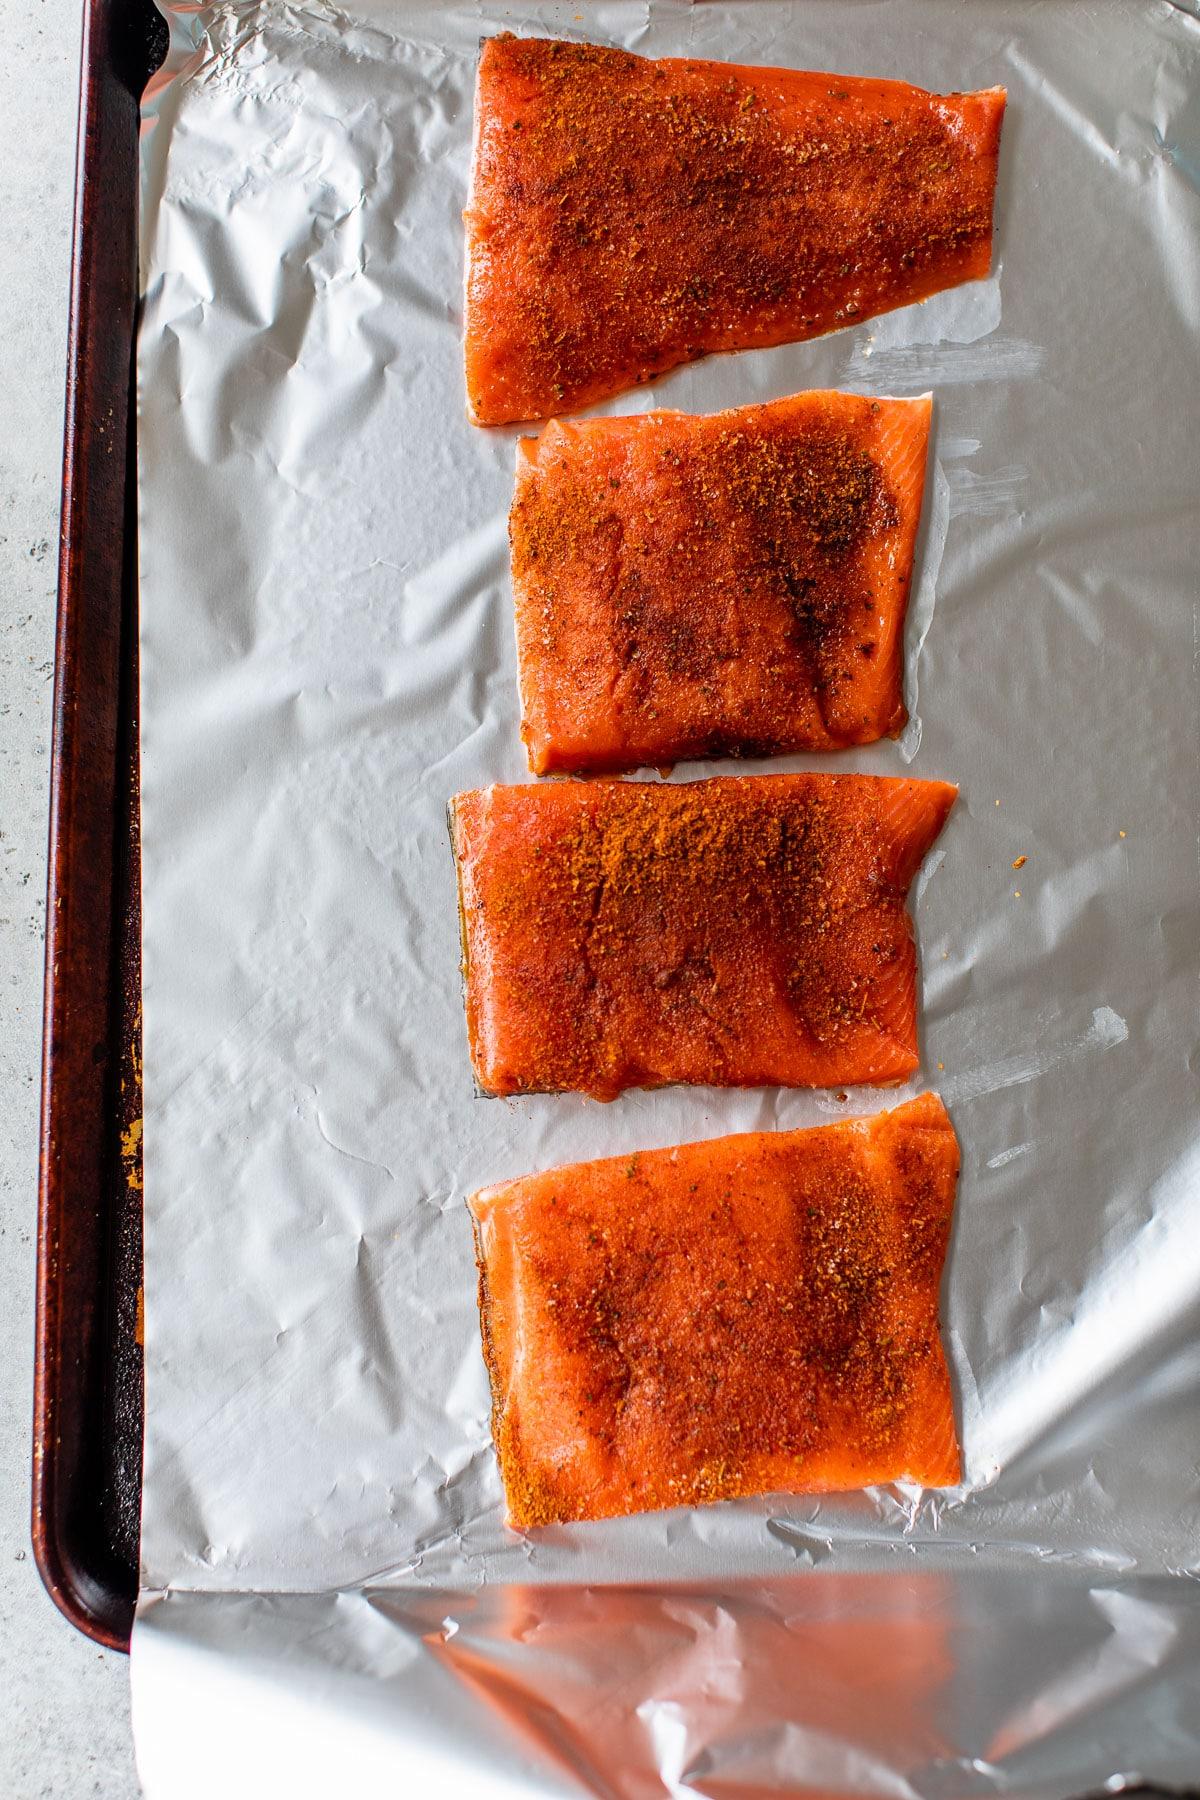 raw salmon fillets on a baking sheet sprinkled with cajun seasoning